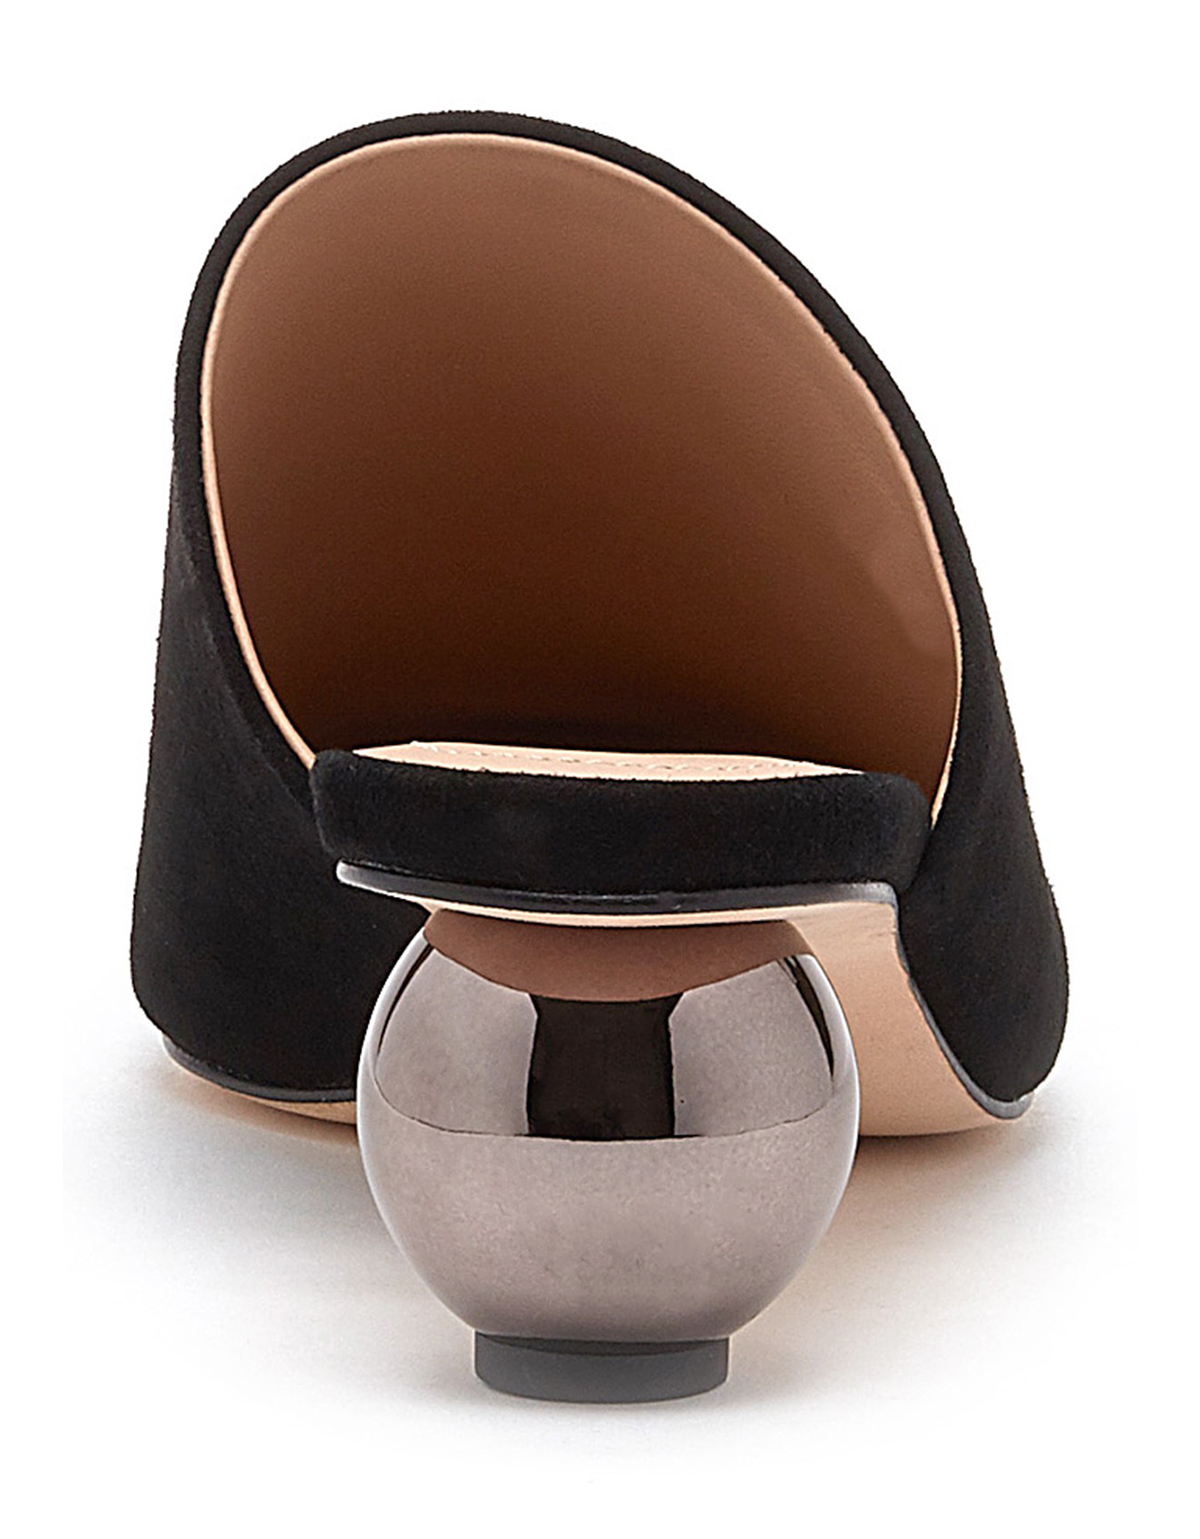 Pour La Victoire Kiera Kiera Kiera Sphere Mirrored Heeled Mule Black Suede Pionted Toe Pump b7c19c